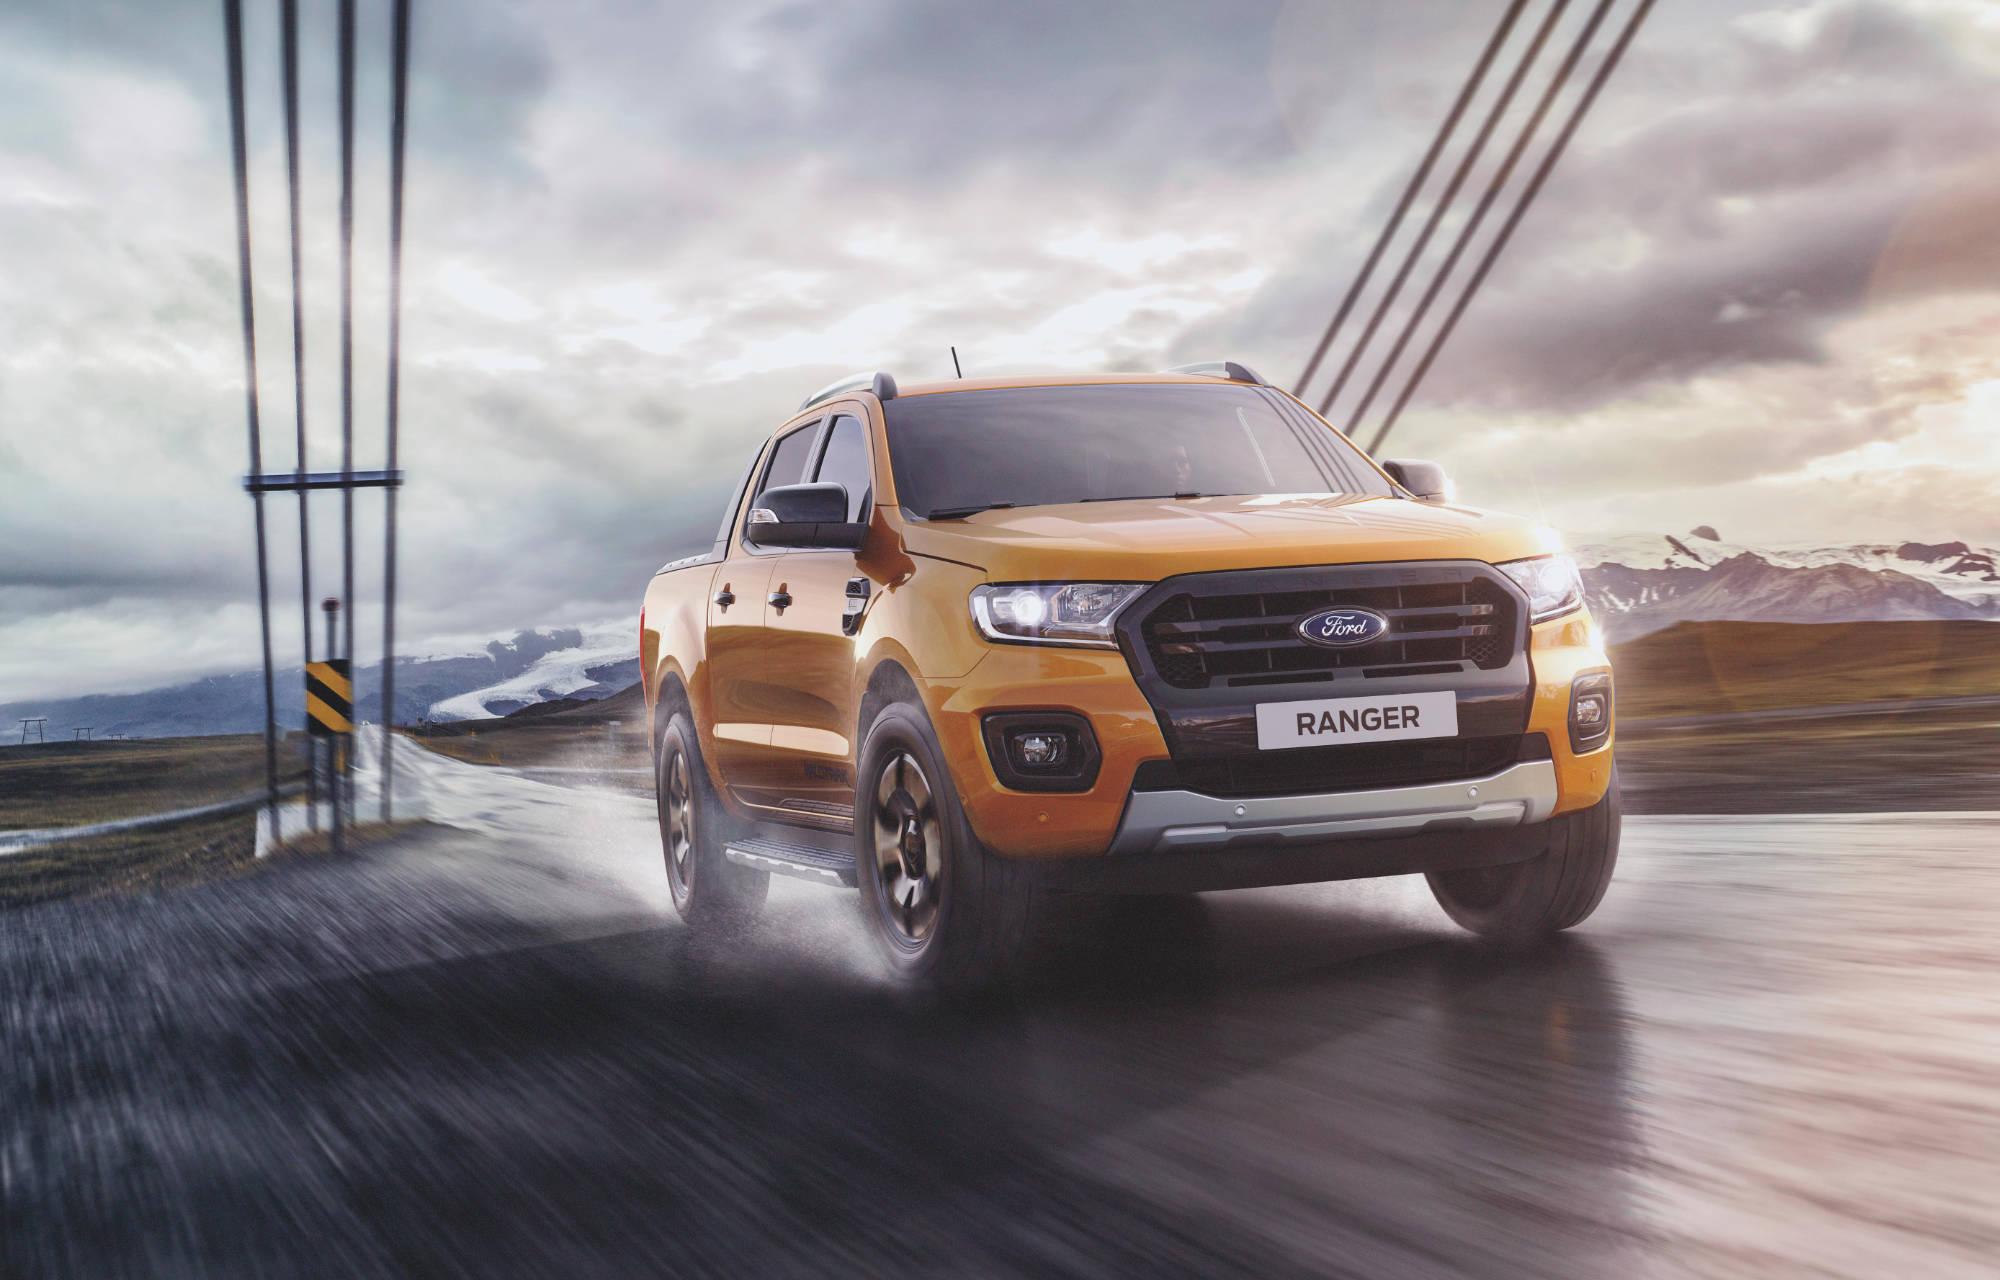 Ranger-Quang-Ninh-Ford